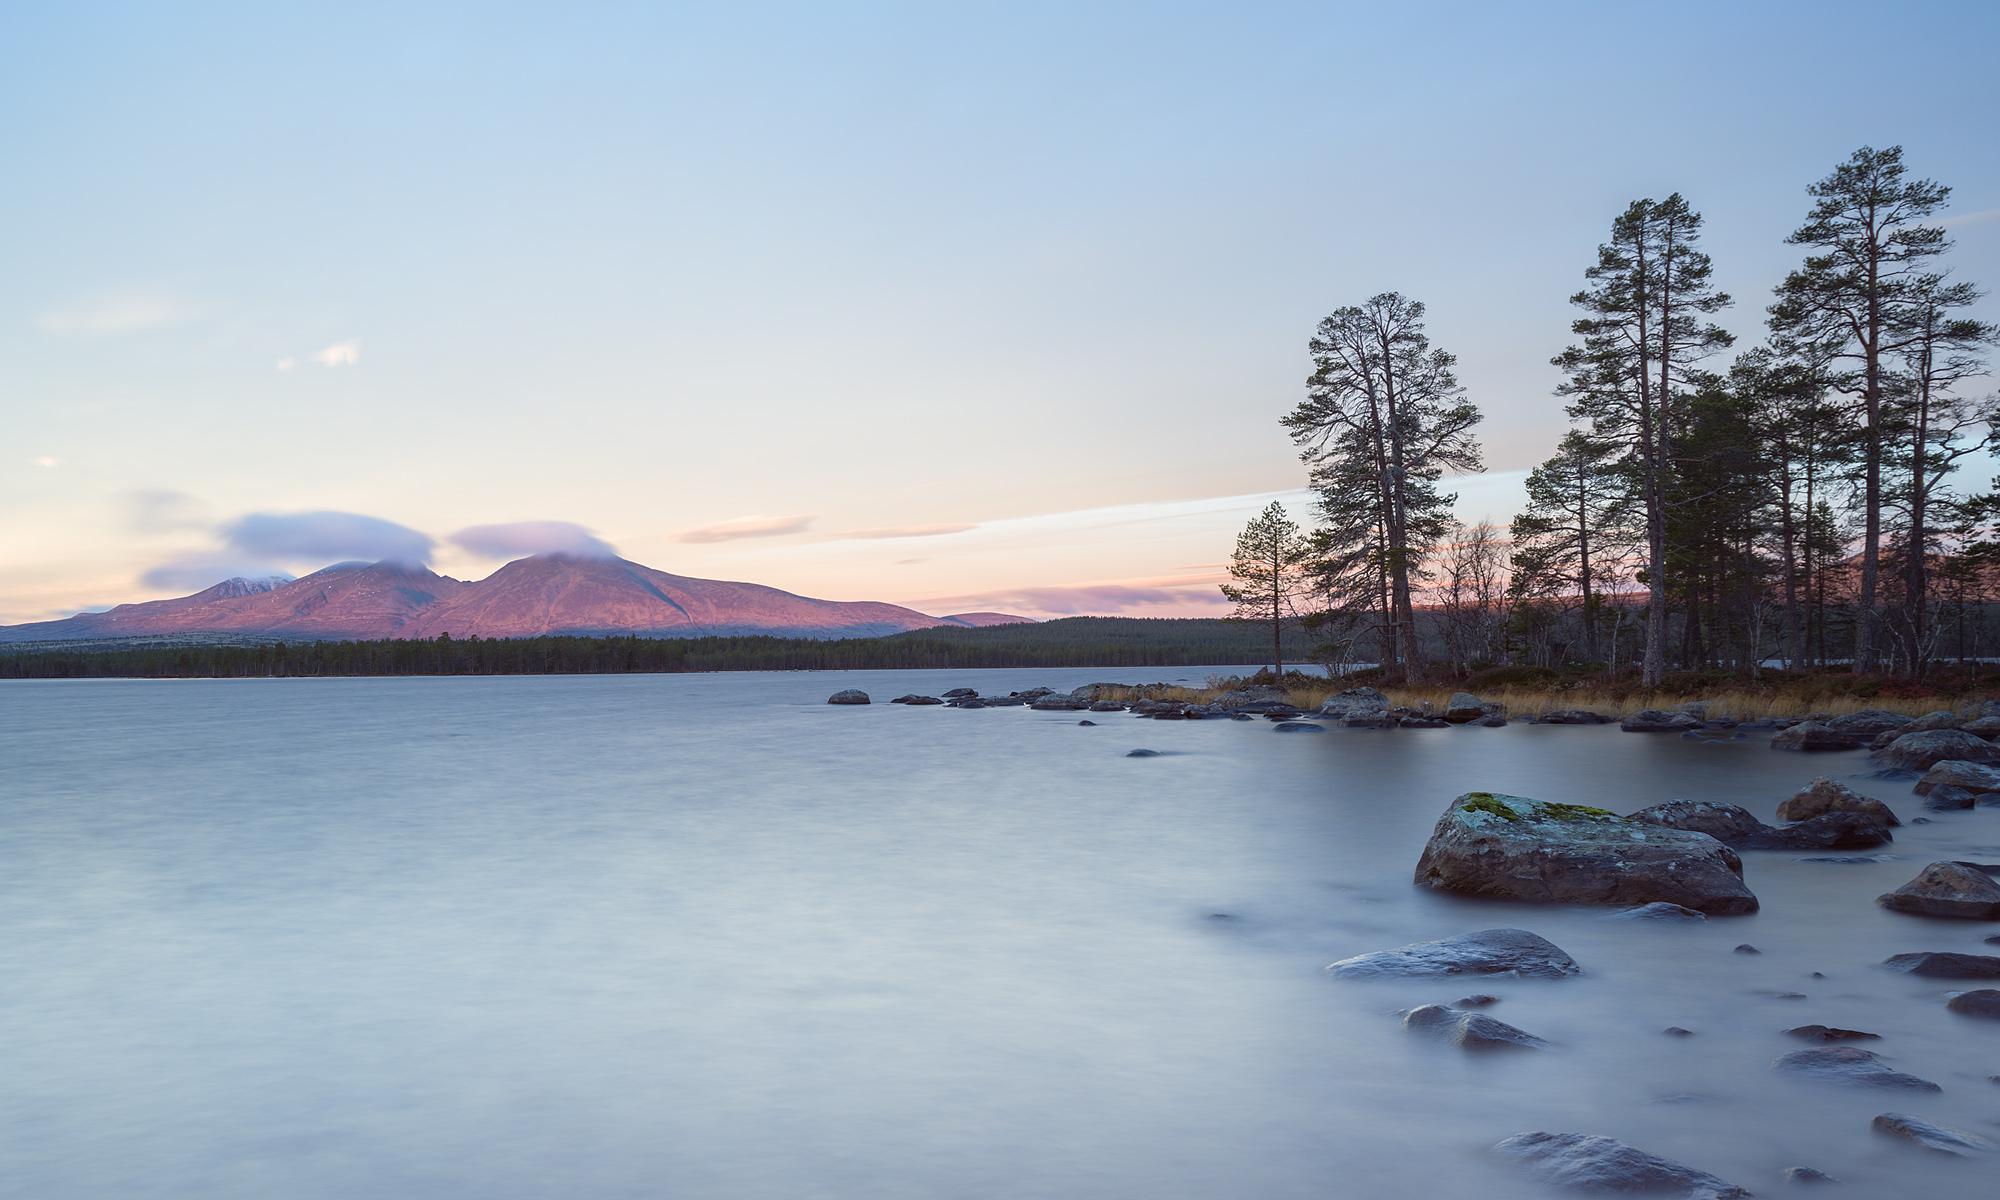 Sunrise at Isteren lake near Drevsjø, Norway – Landscape Photography